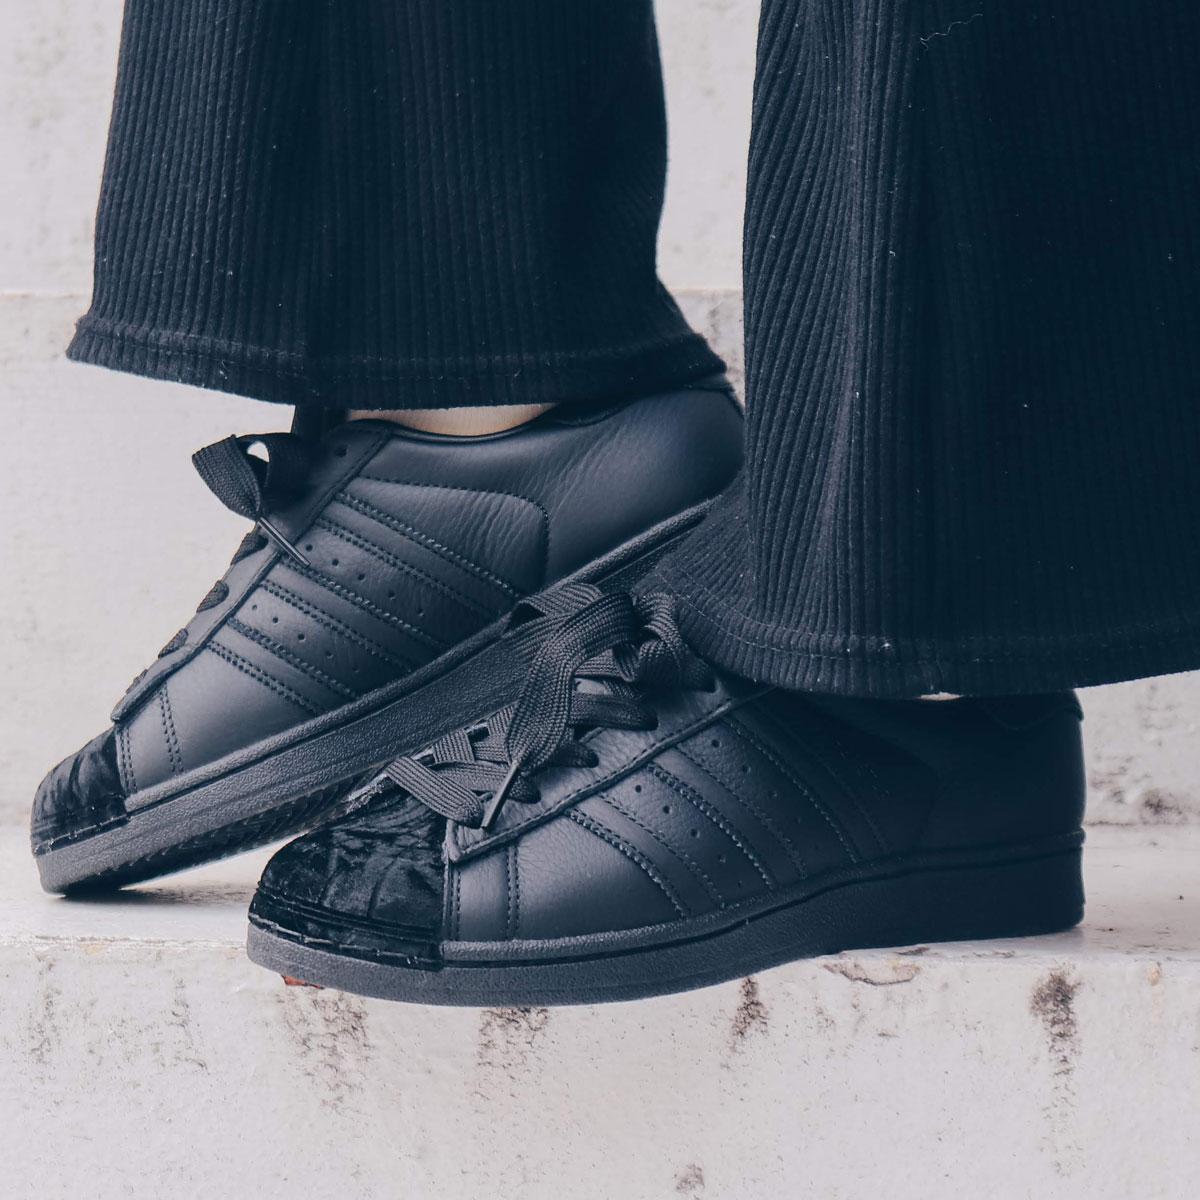 adidas Originals SUPERSTAR W(アディダスオリジナルス スパースター W)CORE BLACK/CORE BLACK/CORE BLACK【メンズ レディース スニーカー】19SS-I